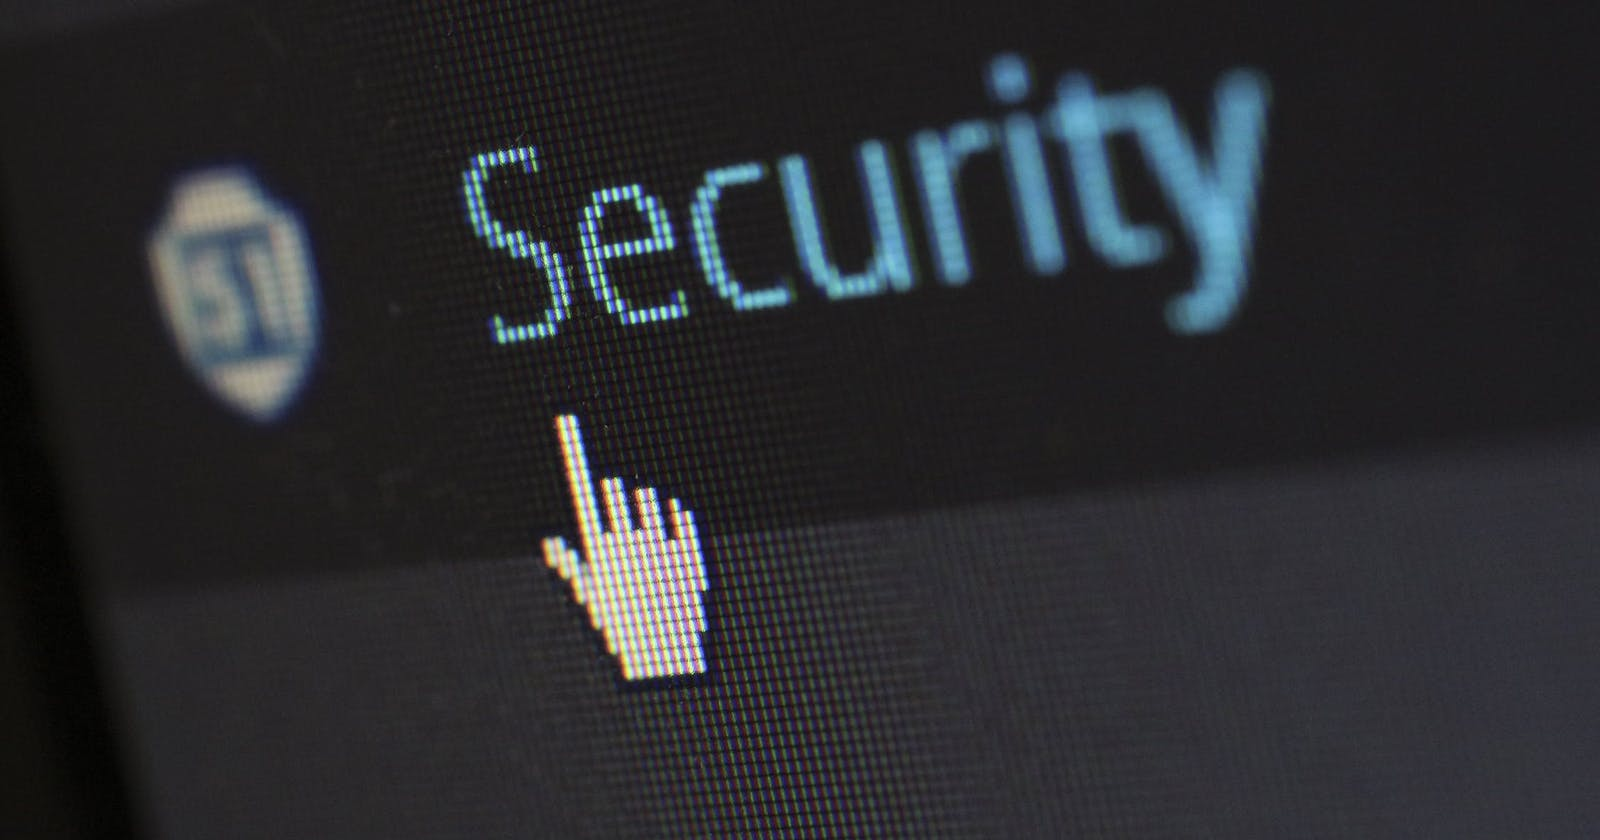 OpenSSL Common Usage